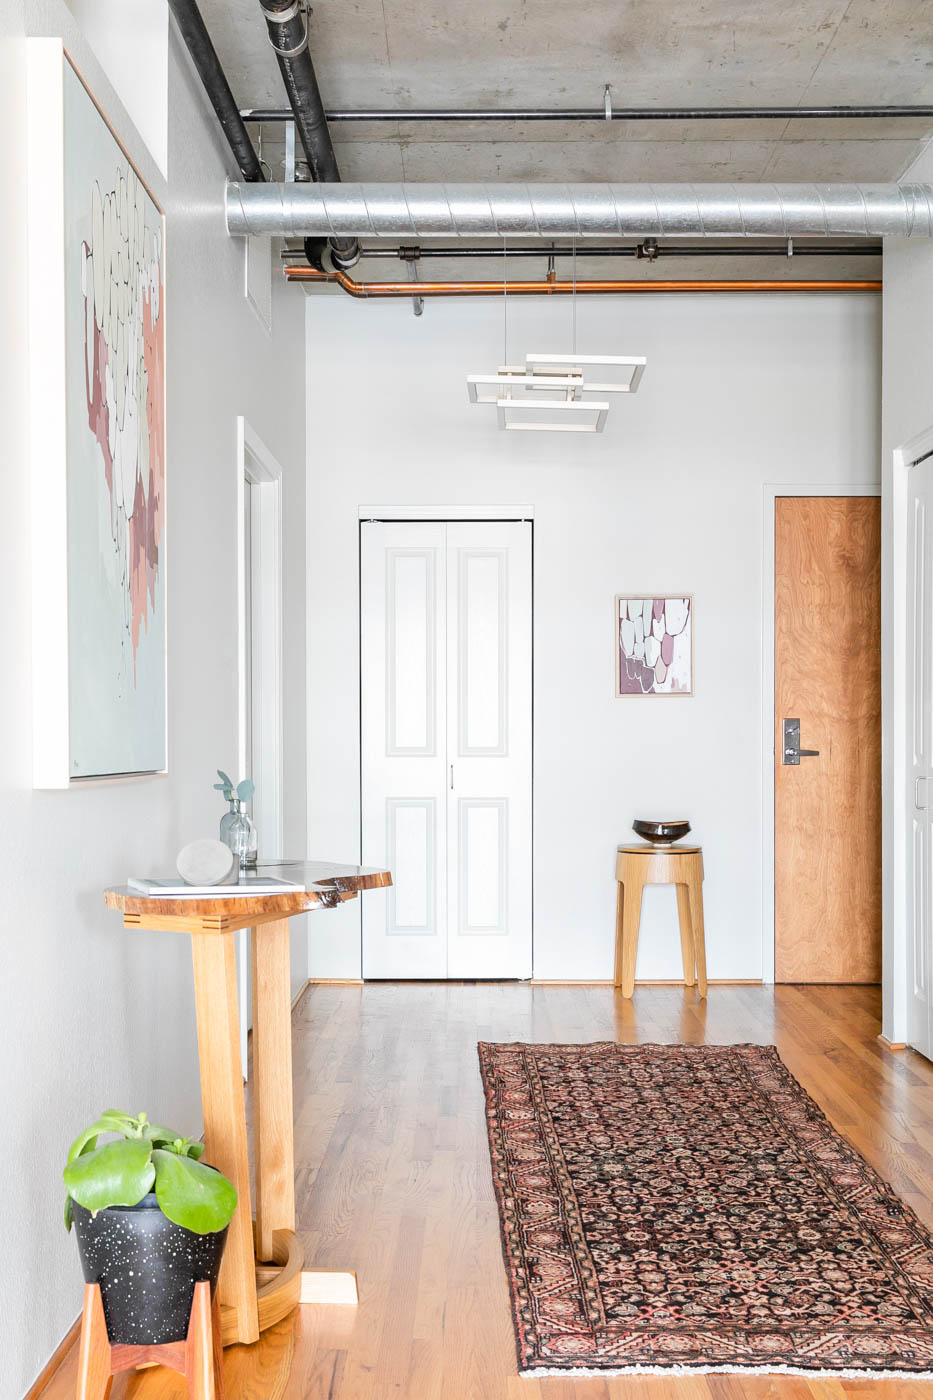 ArtistLoft-DenverCO-natural-light-photography-studio-lifestyle-photoshoot-location-editorial-commercial-photography-33.jpg